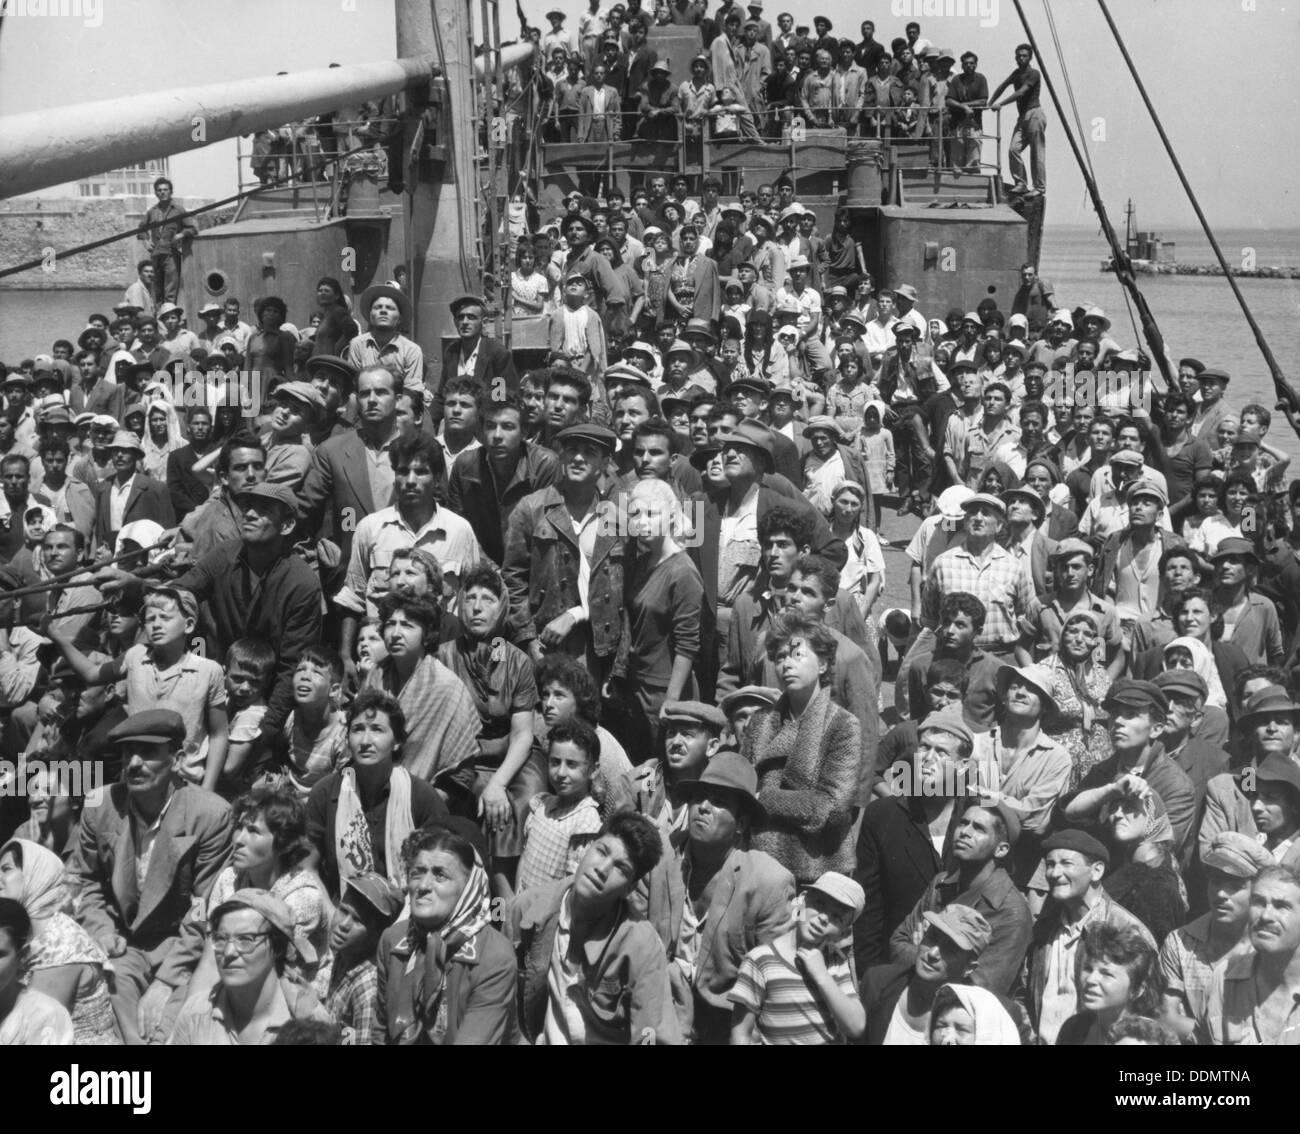 Scene from the film Exodus, 1960. - Stock Image